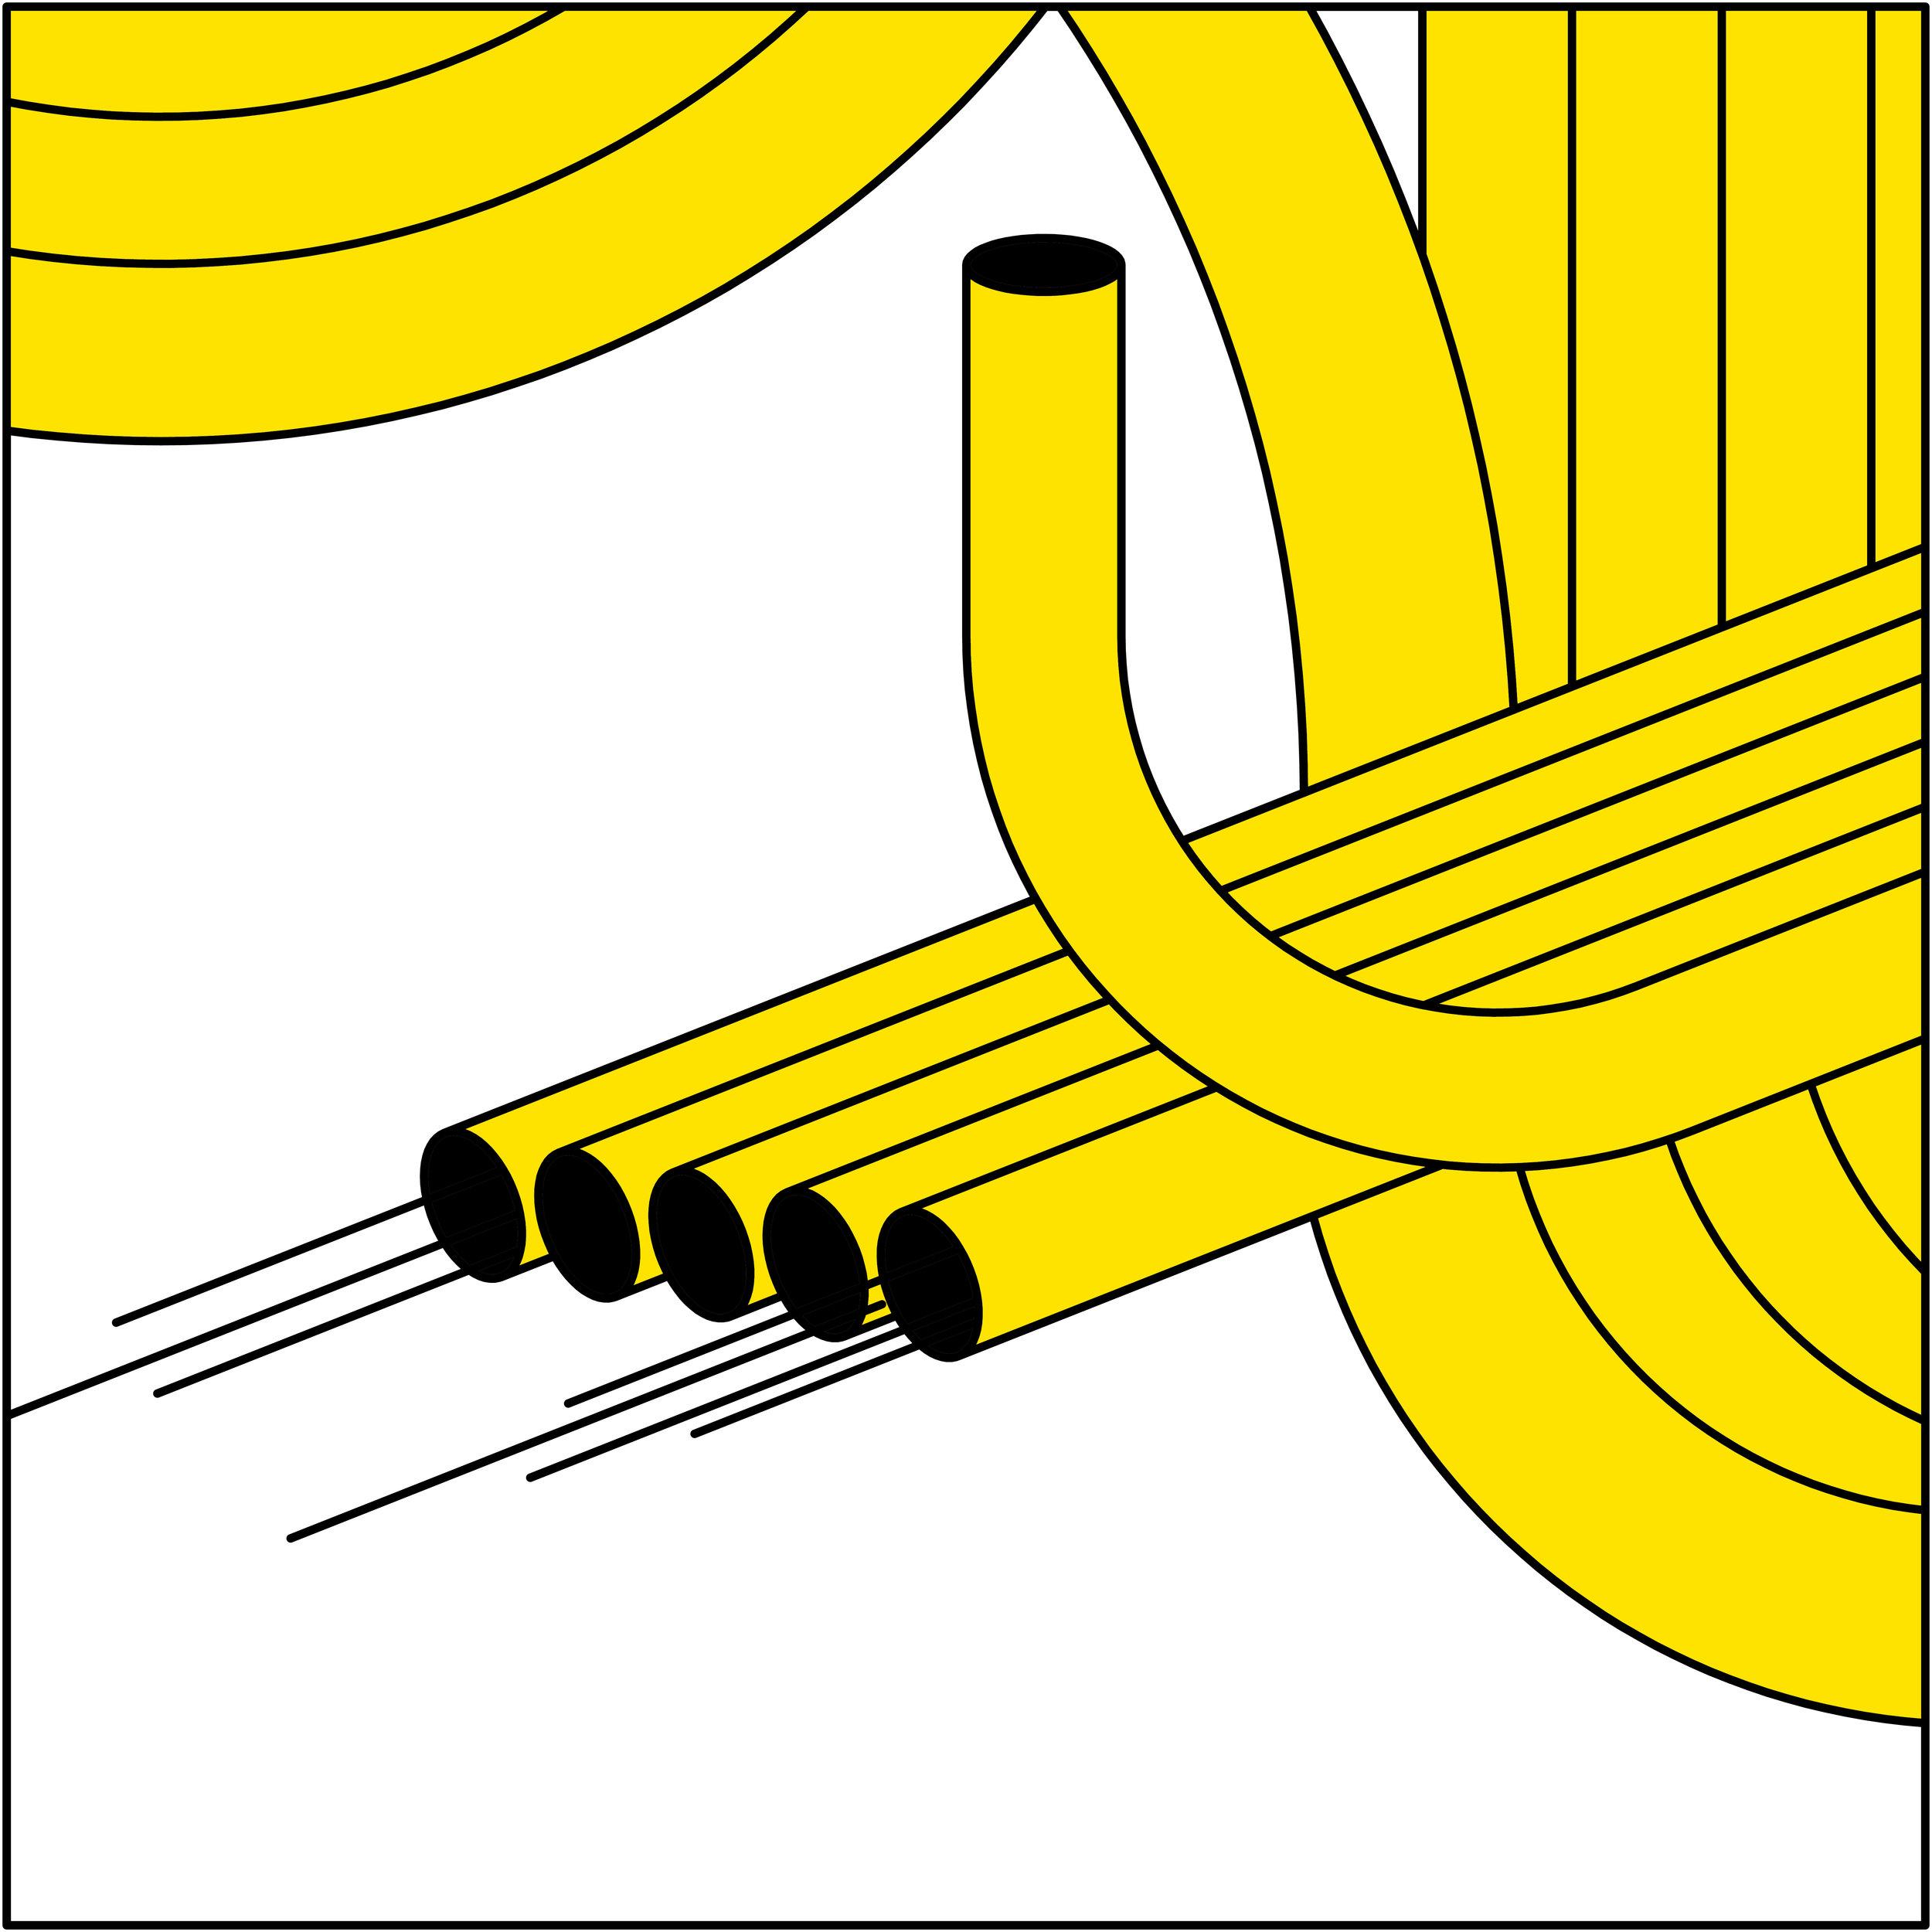 spaghetti yellow - 014.jpg